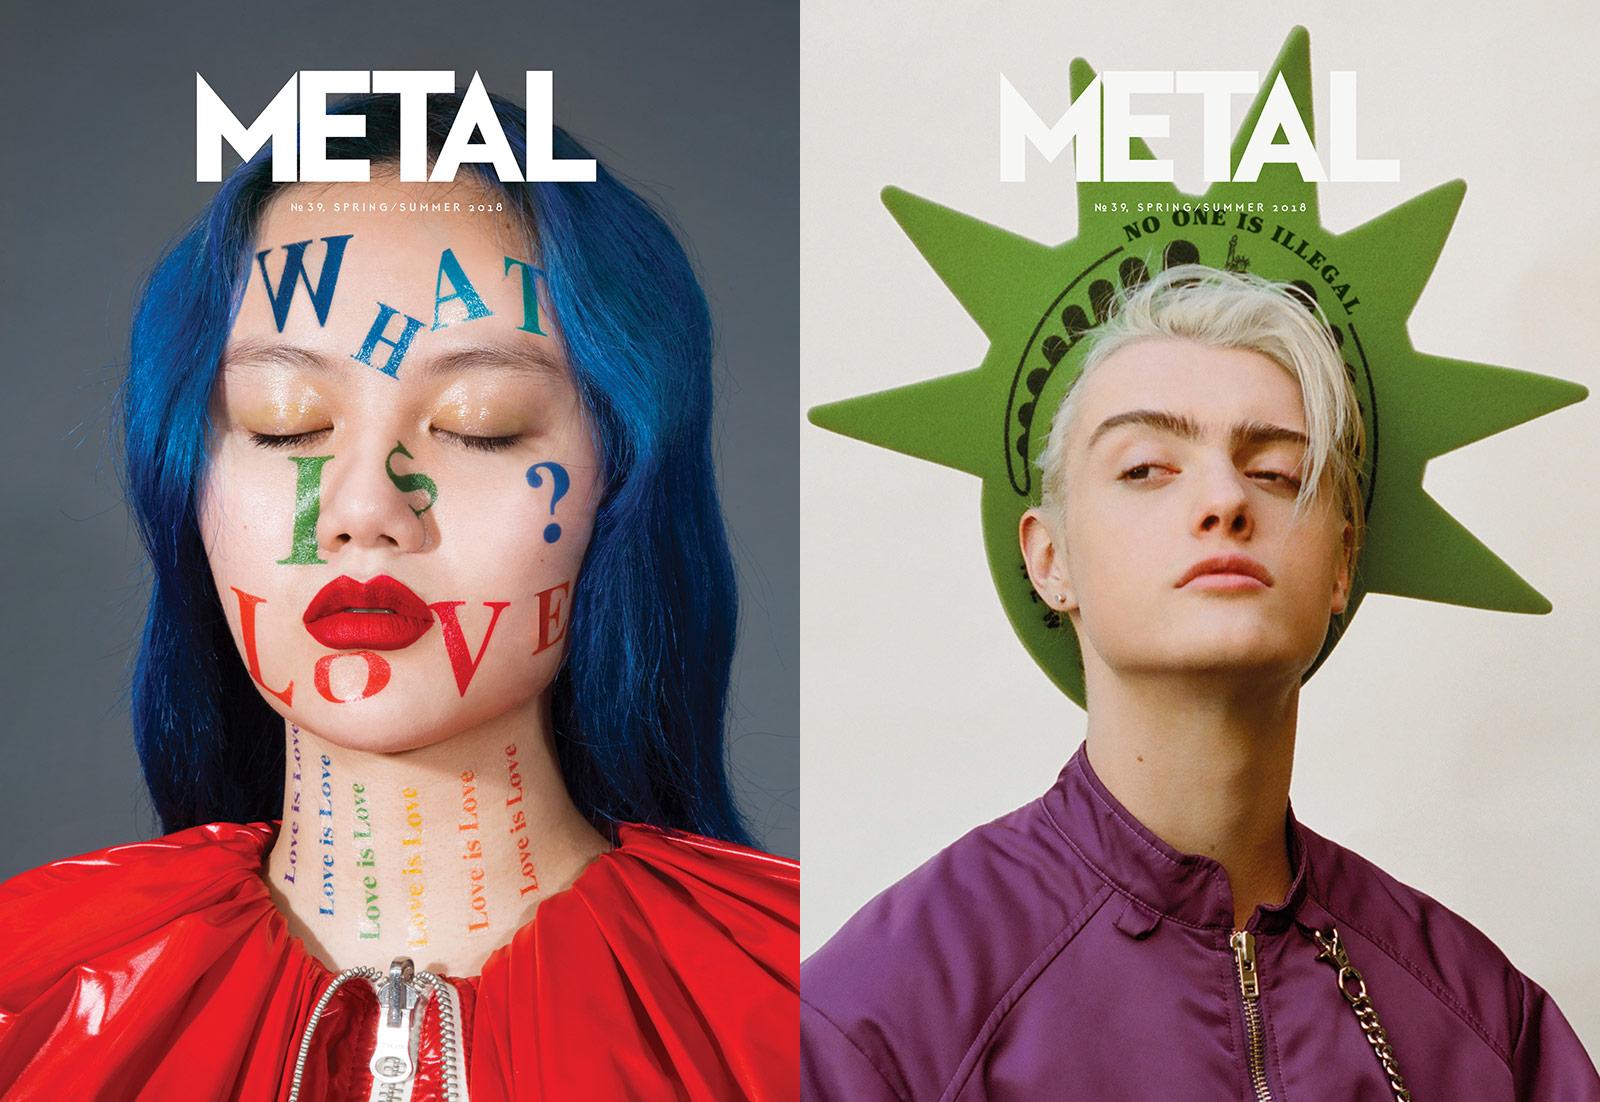 Metal39 covers